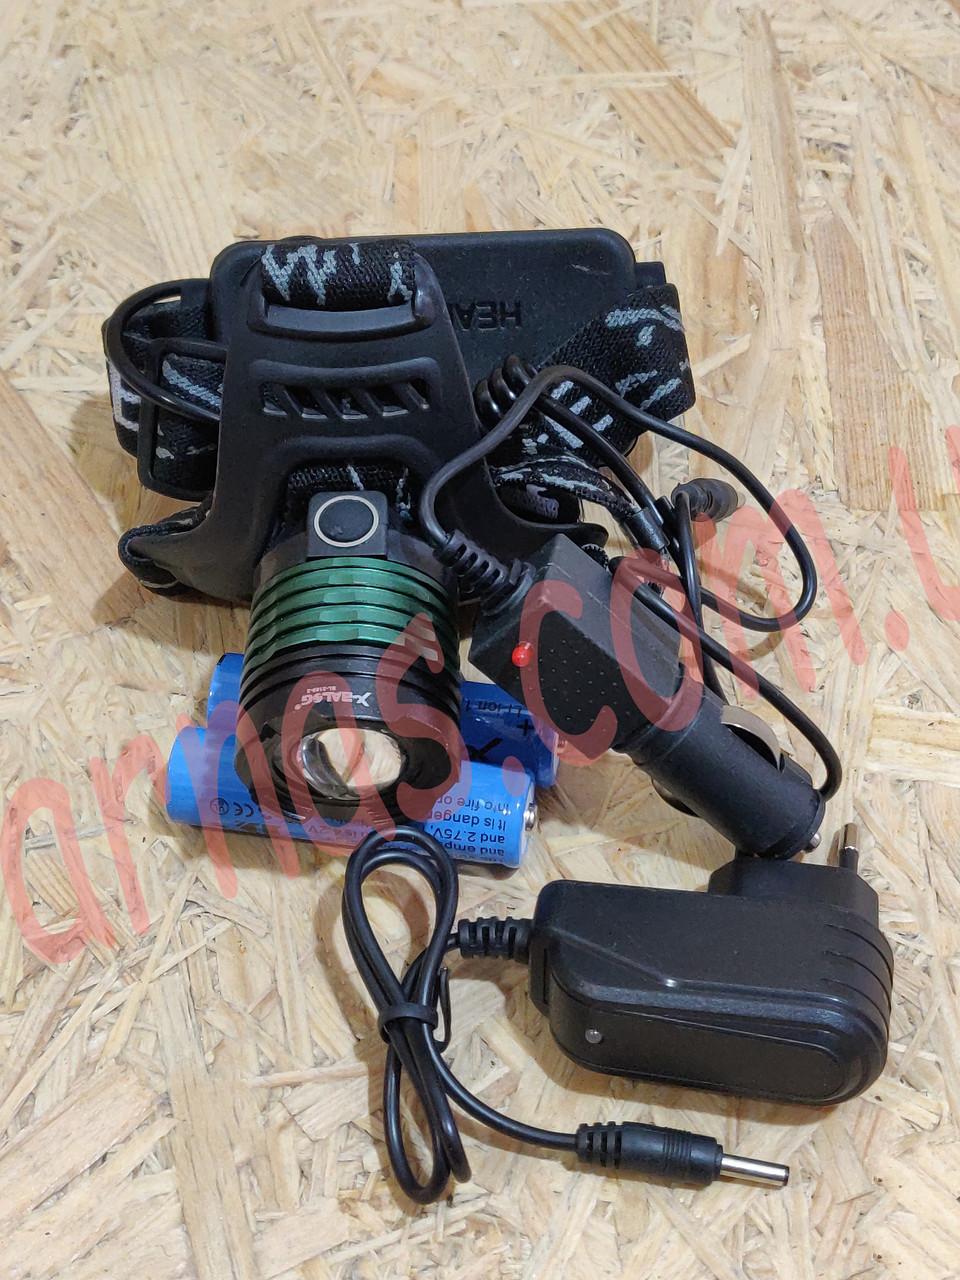 Аккумуляторный налобный фонарь Bailong BL-2189-2 ультрафиолет